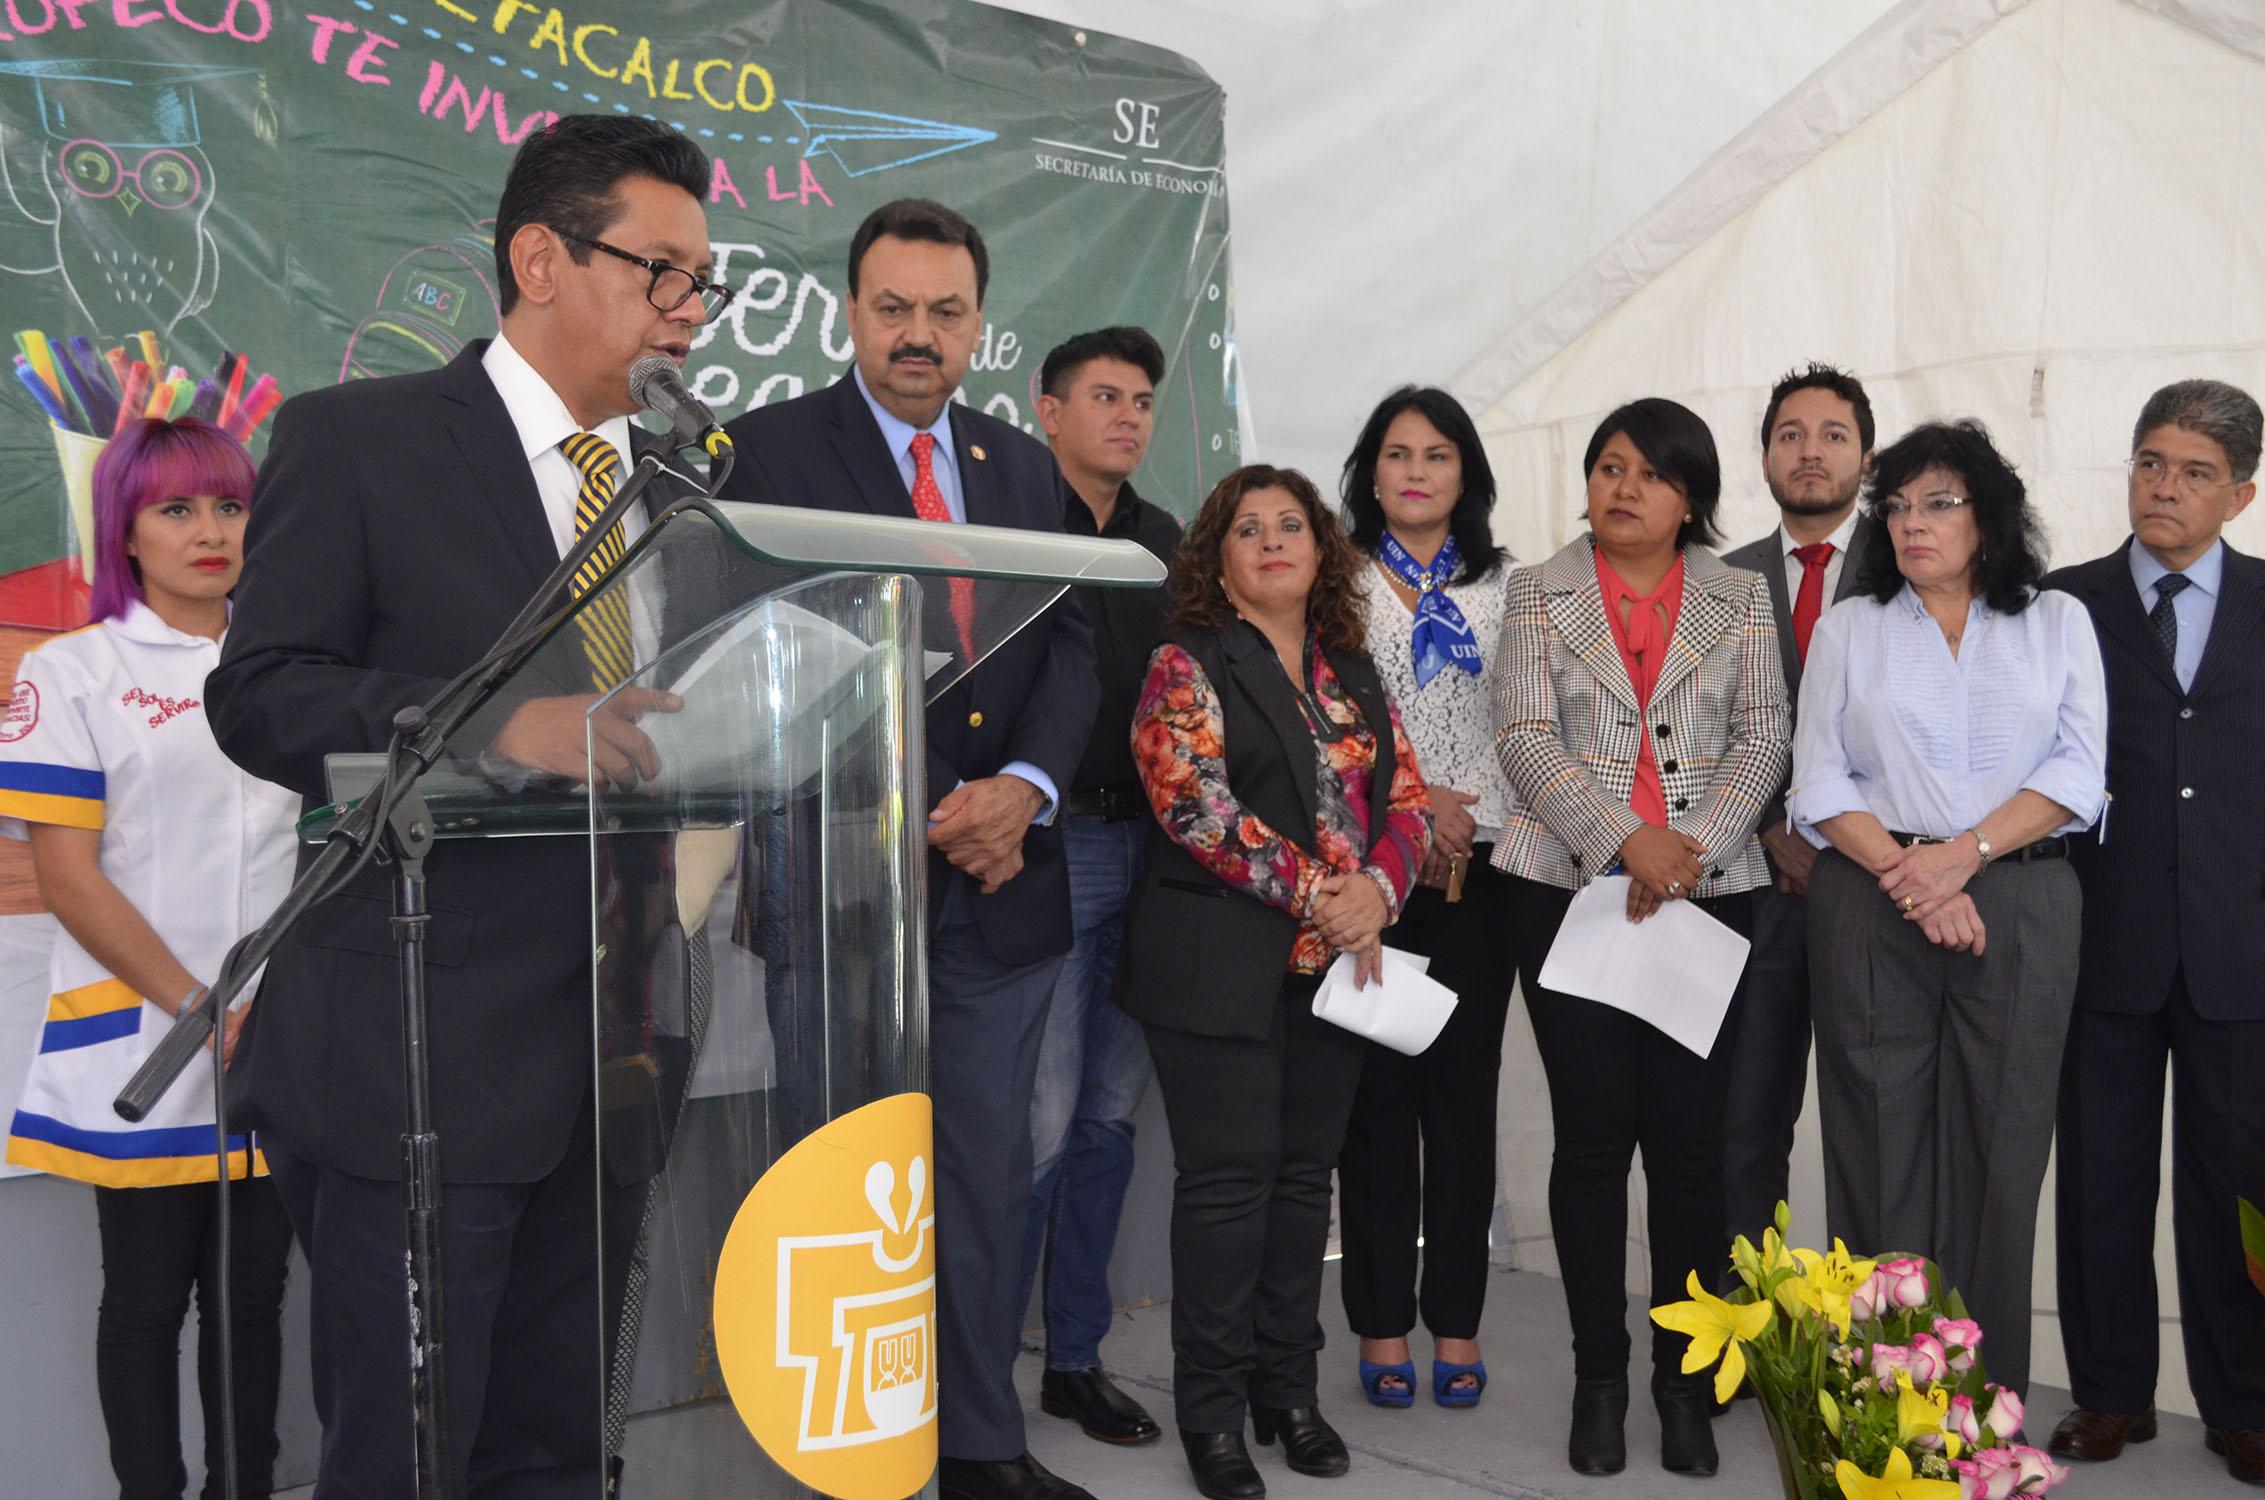 INICIA FERIA DEL REGRESO A CLASES EN IZTACALCO